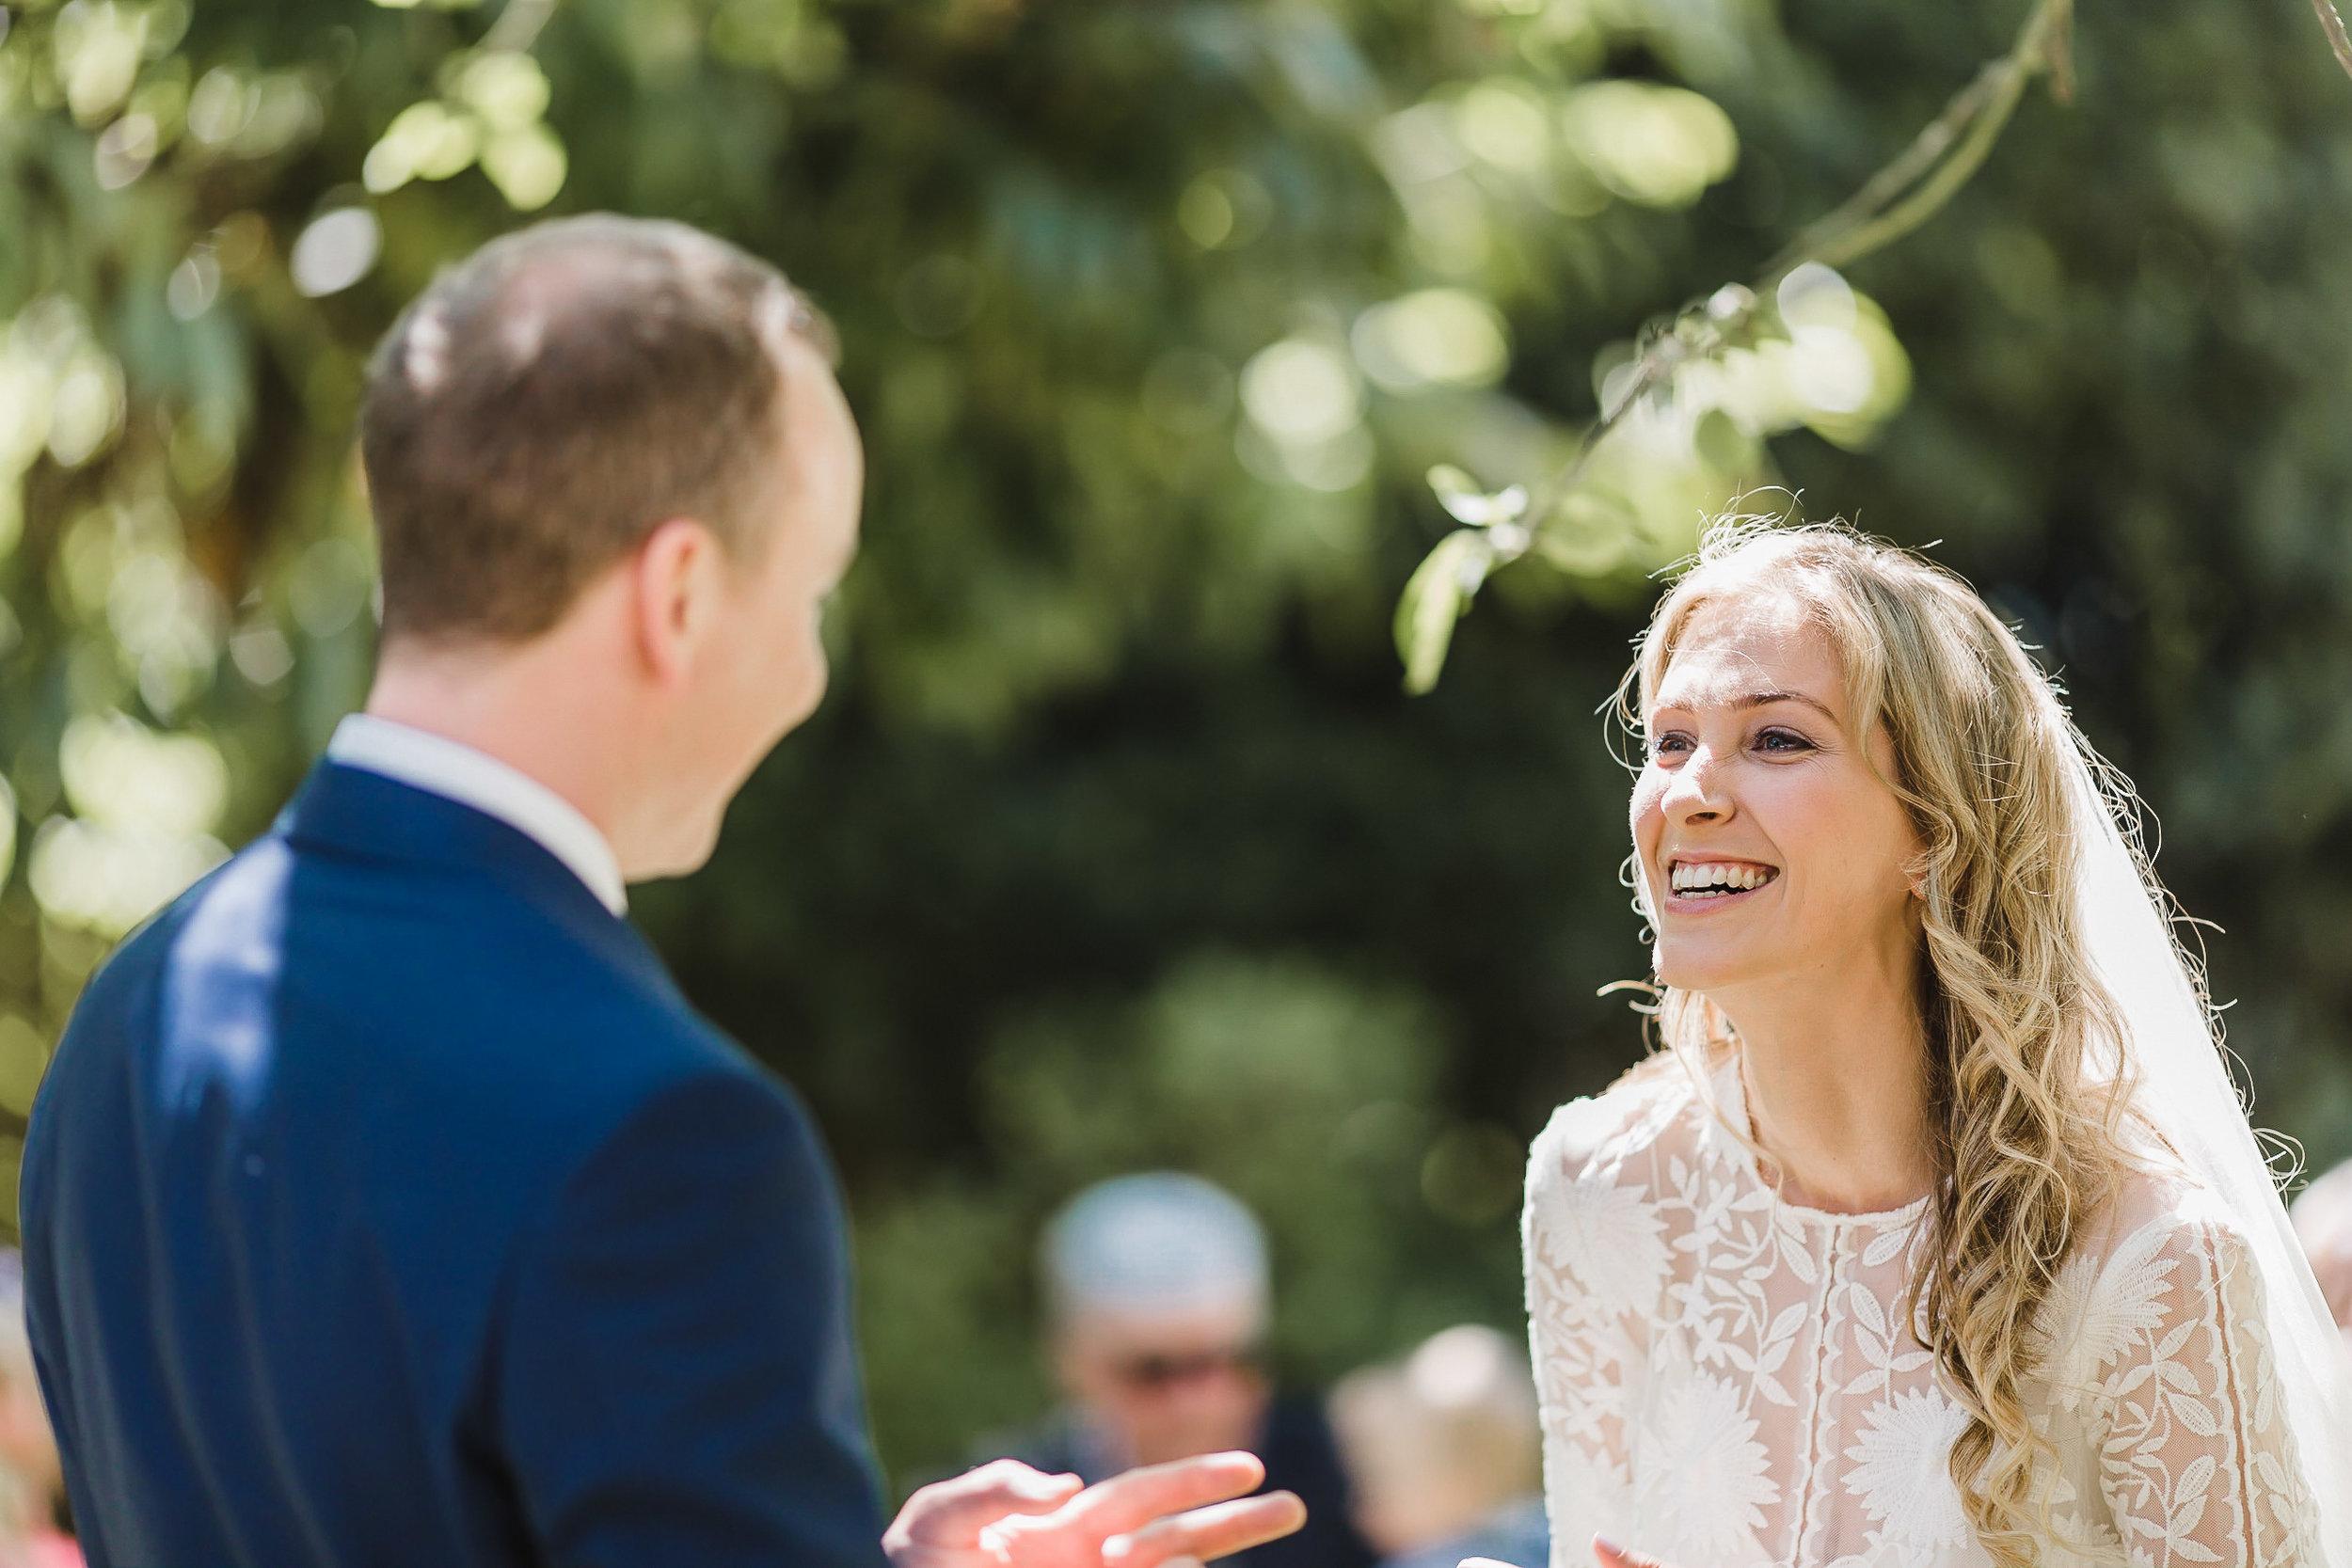 Roundhay-Leeds-Backyard-Wedding-Becs-Chris-096.jpg